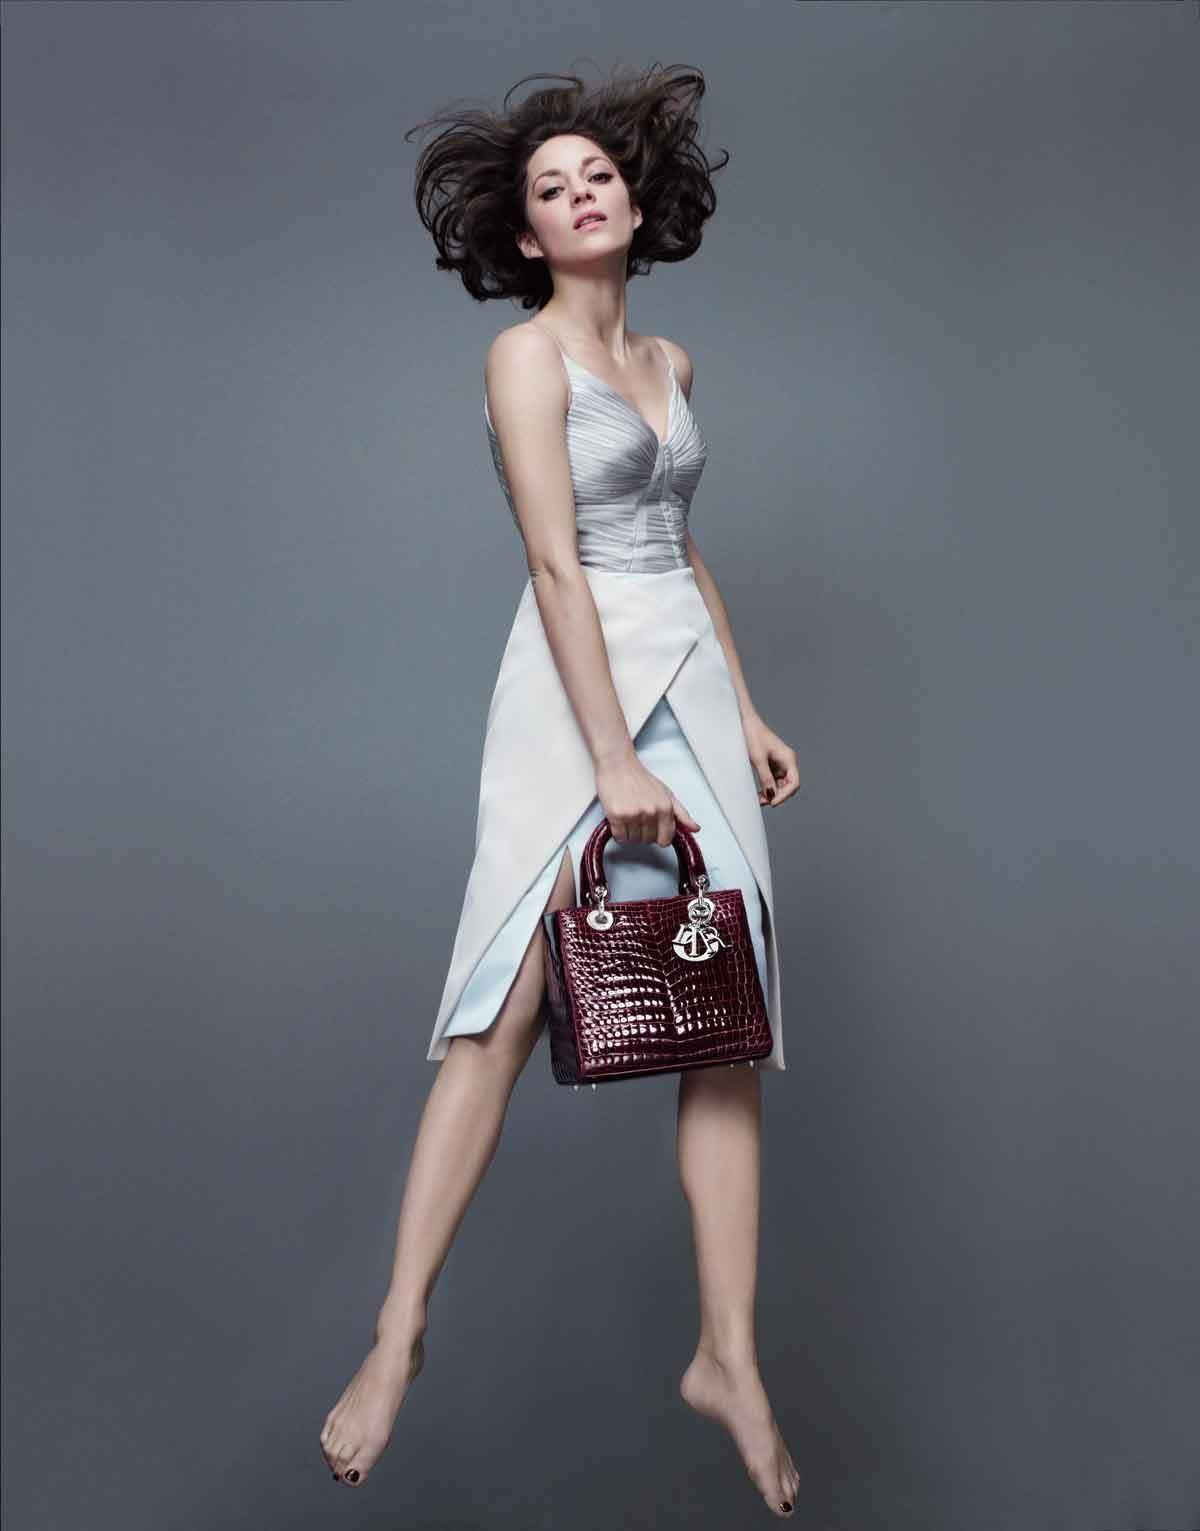 Watch - Cotillard marion lady dior campaign spring video